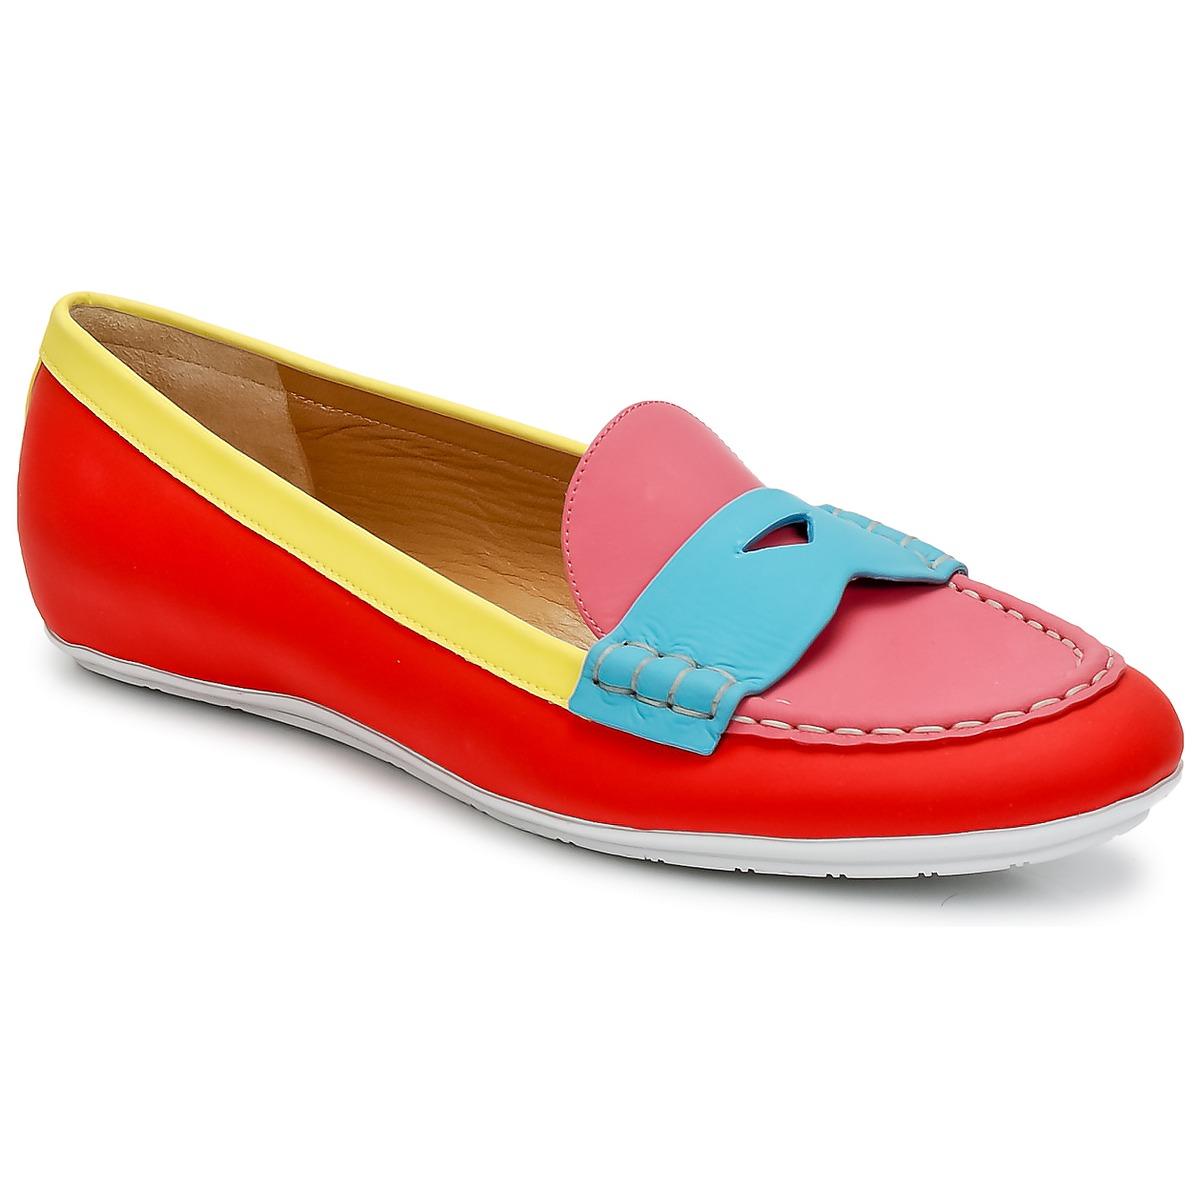 Marc Jacobs SAHARA SOFT CALF Multifarben - Kostenloser Versand bei Spartoode ! - Schuhe Slipper Damen 197,50 €